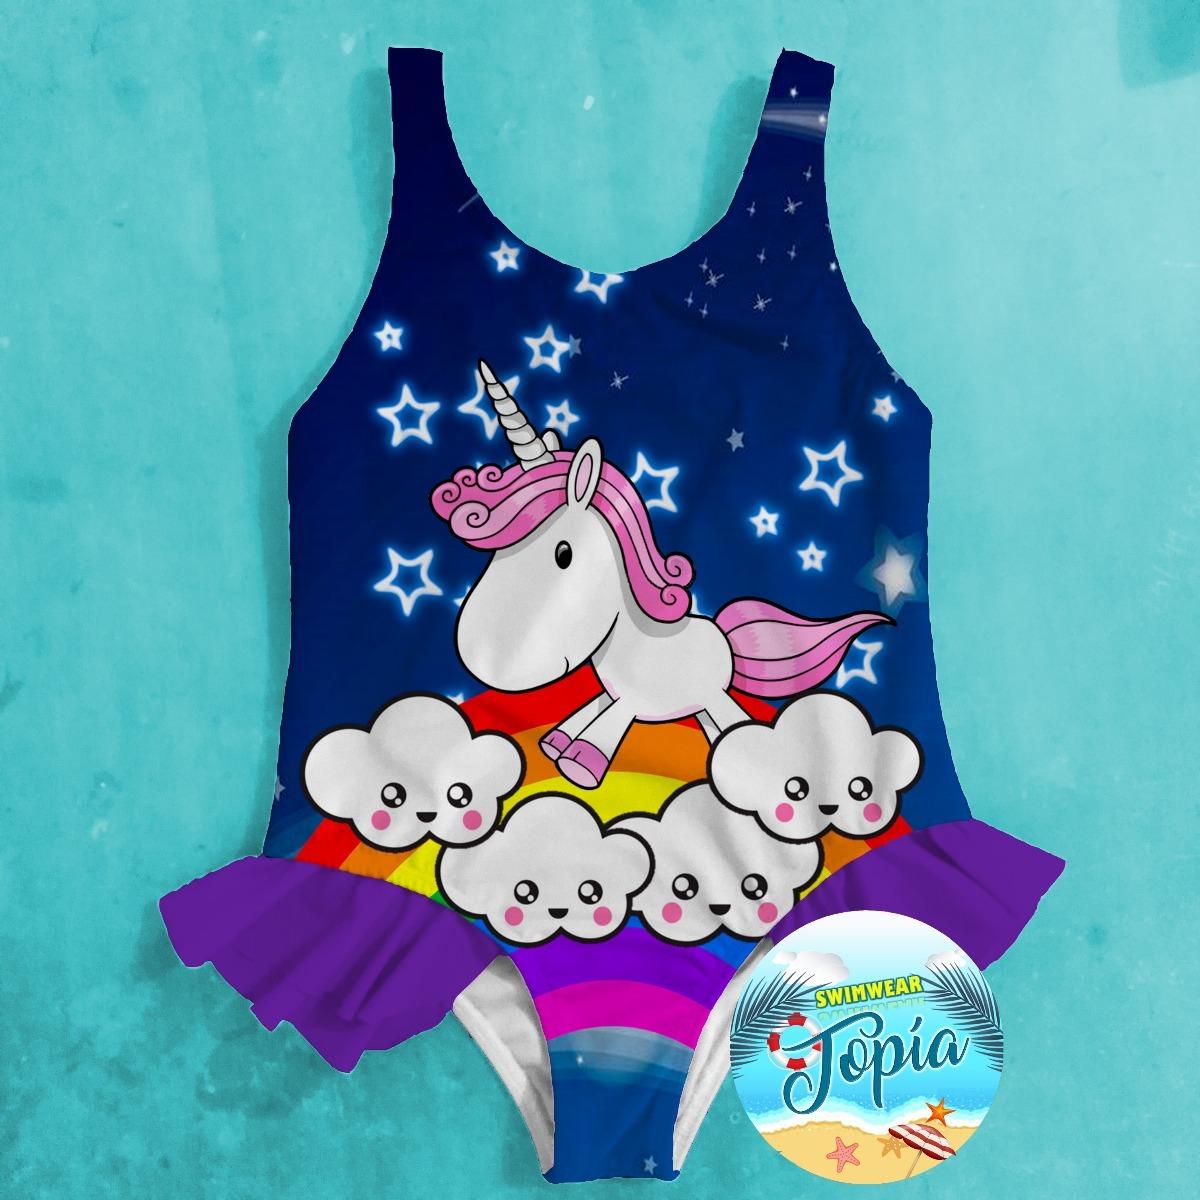 fde3fb18d7 traje vestido de baño de niña unicornio lol surprise moana. Cargando zoom.